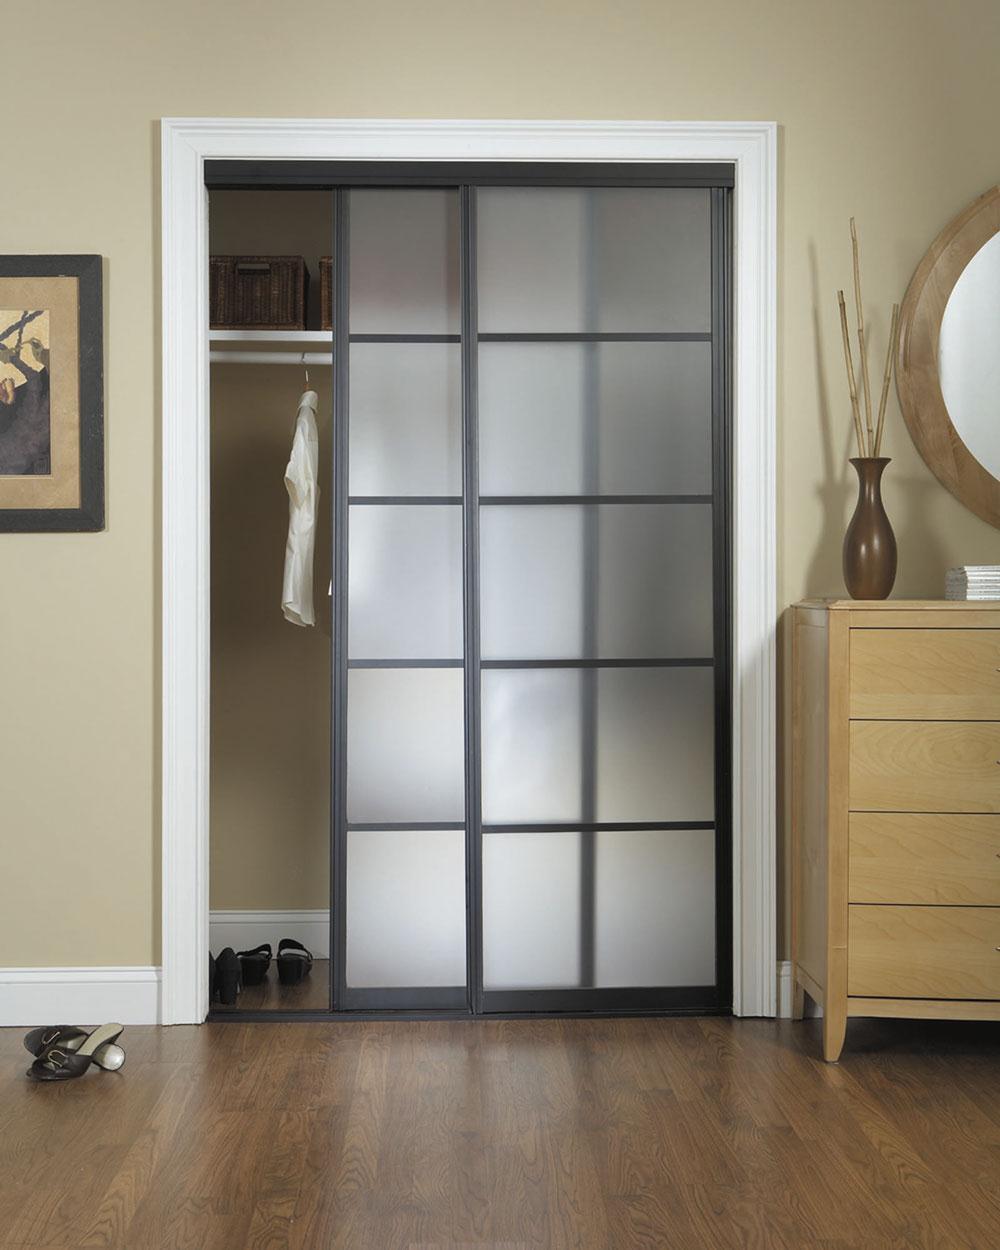 Sliding Doors Between Kitchen And Dining Room